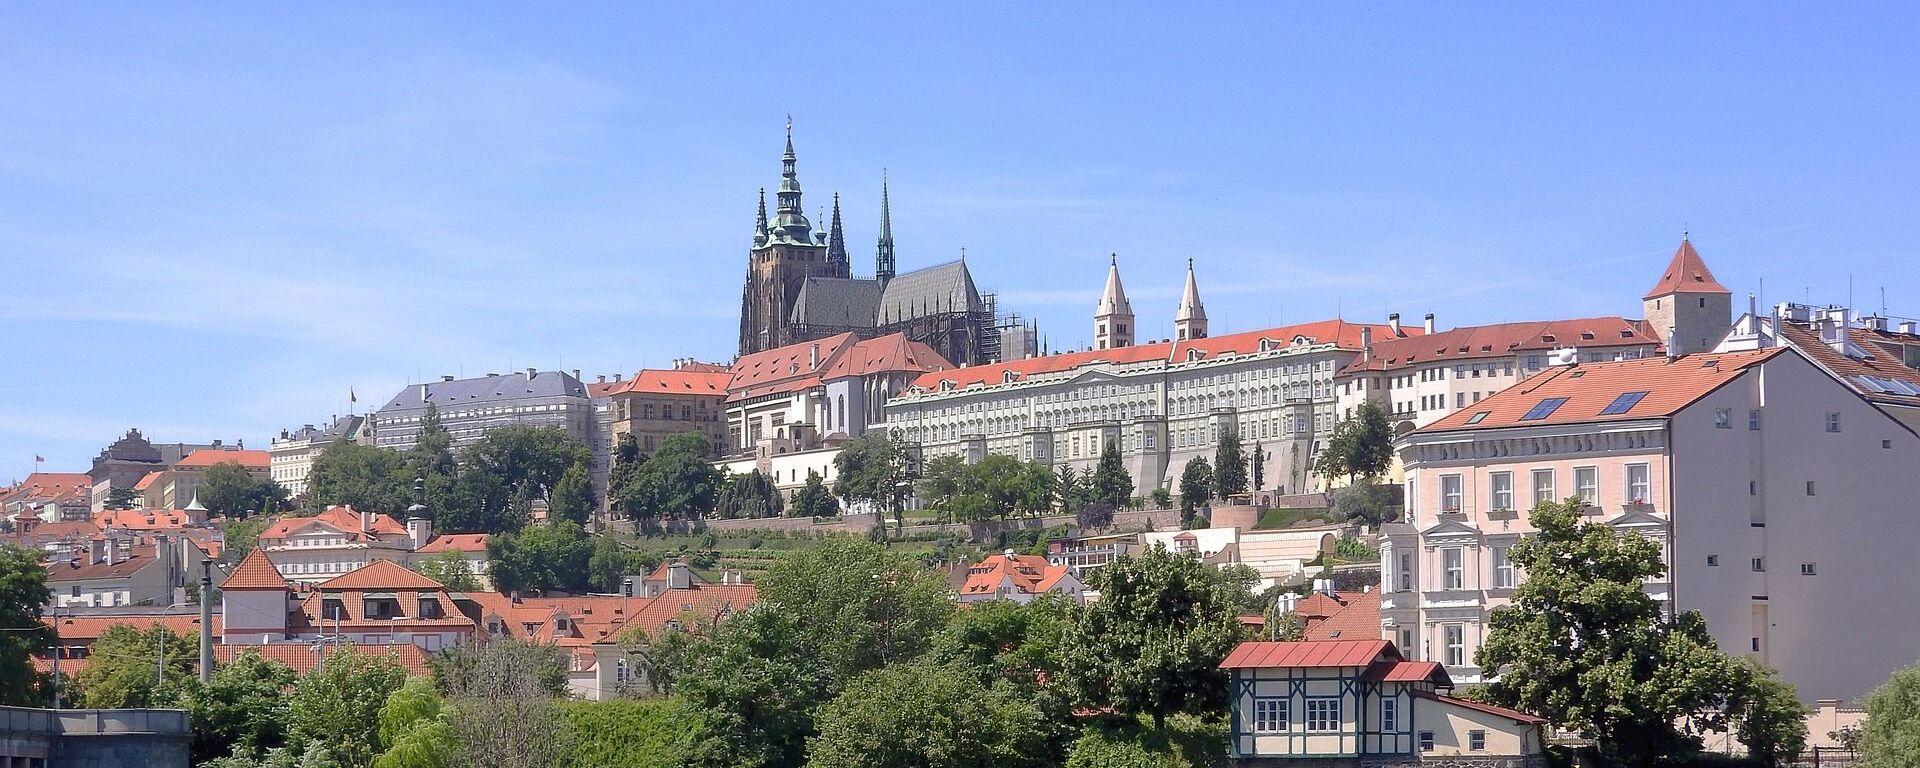 Pražský hrad - Sputnik Česká republika, 1920, 11.10.2021